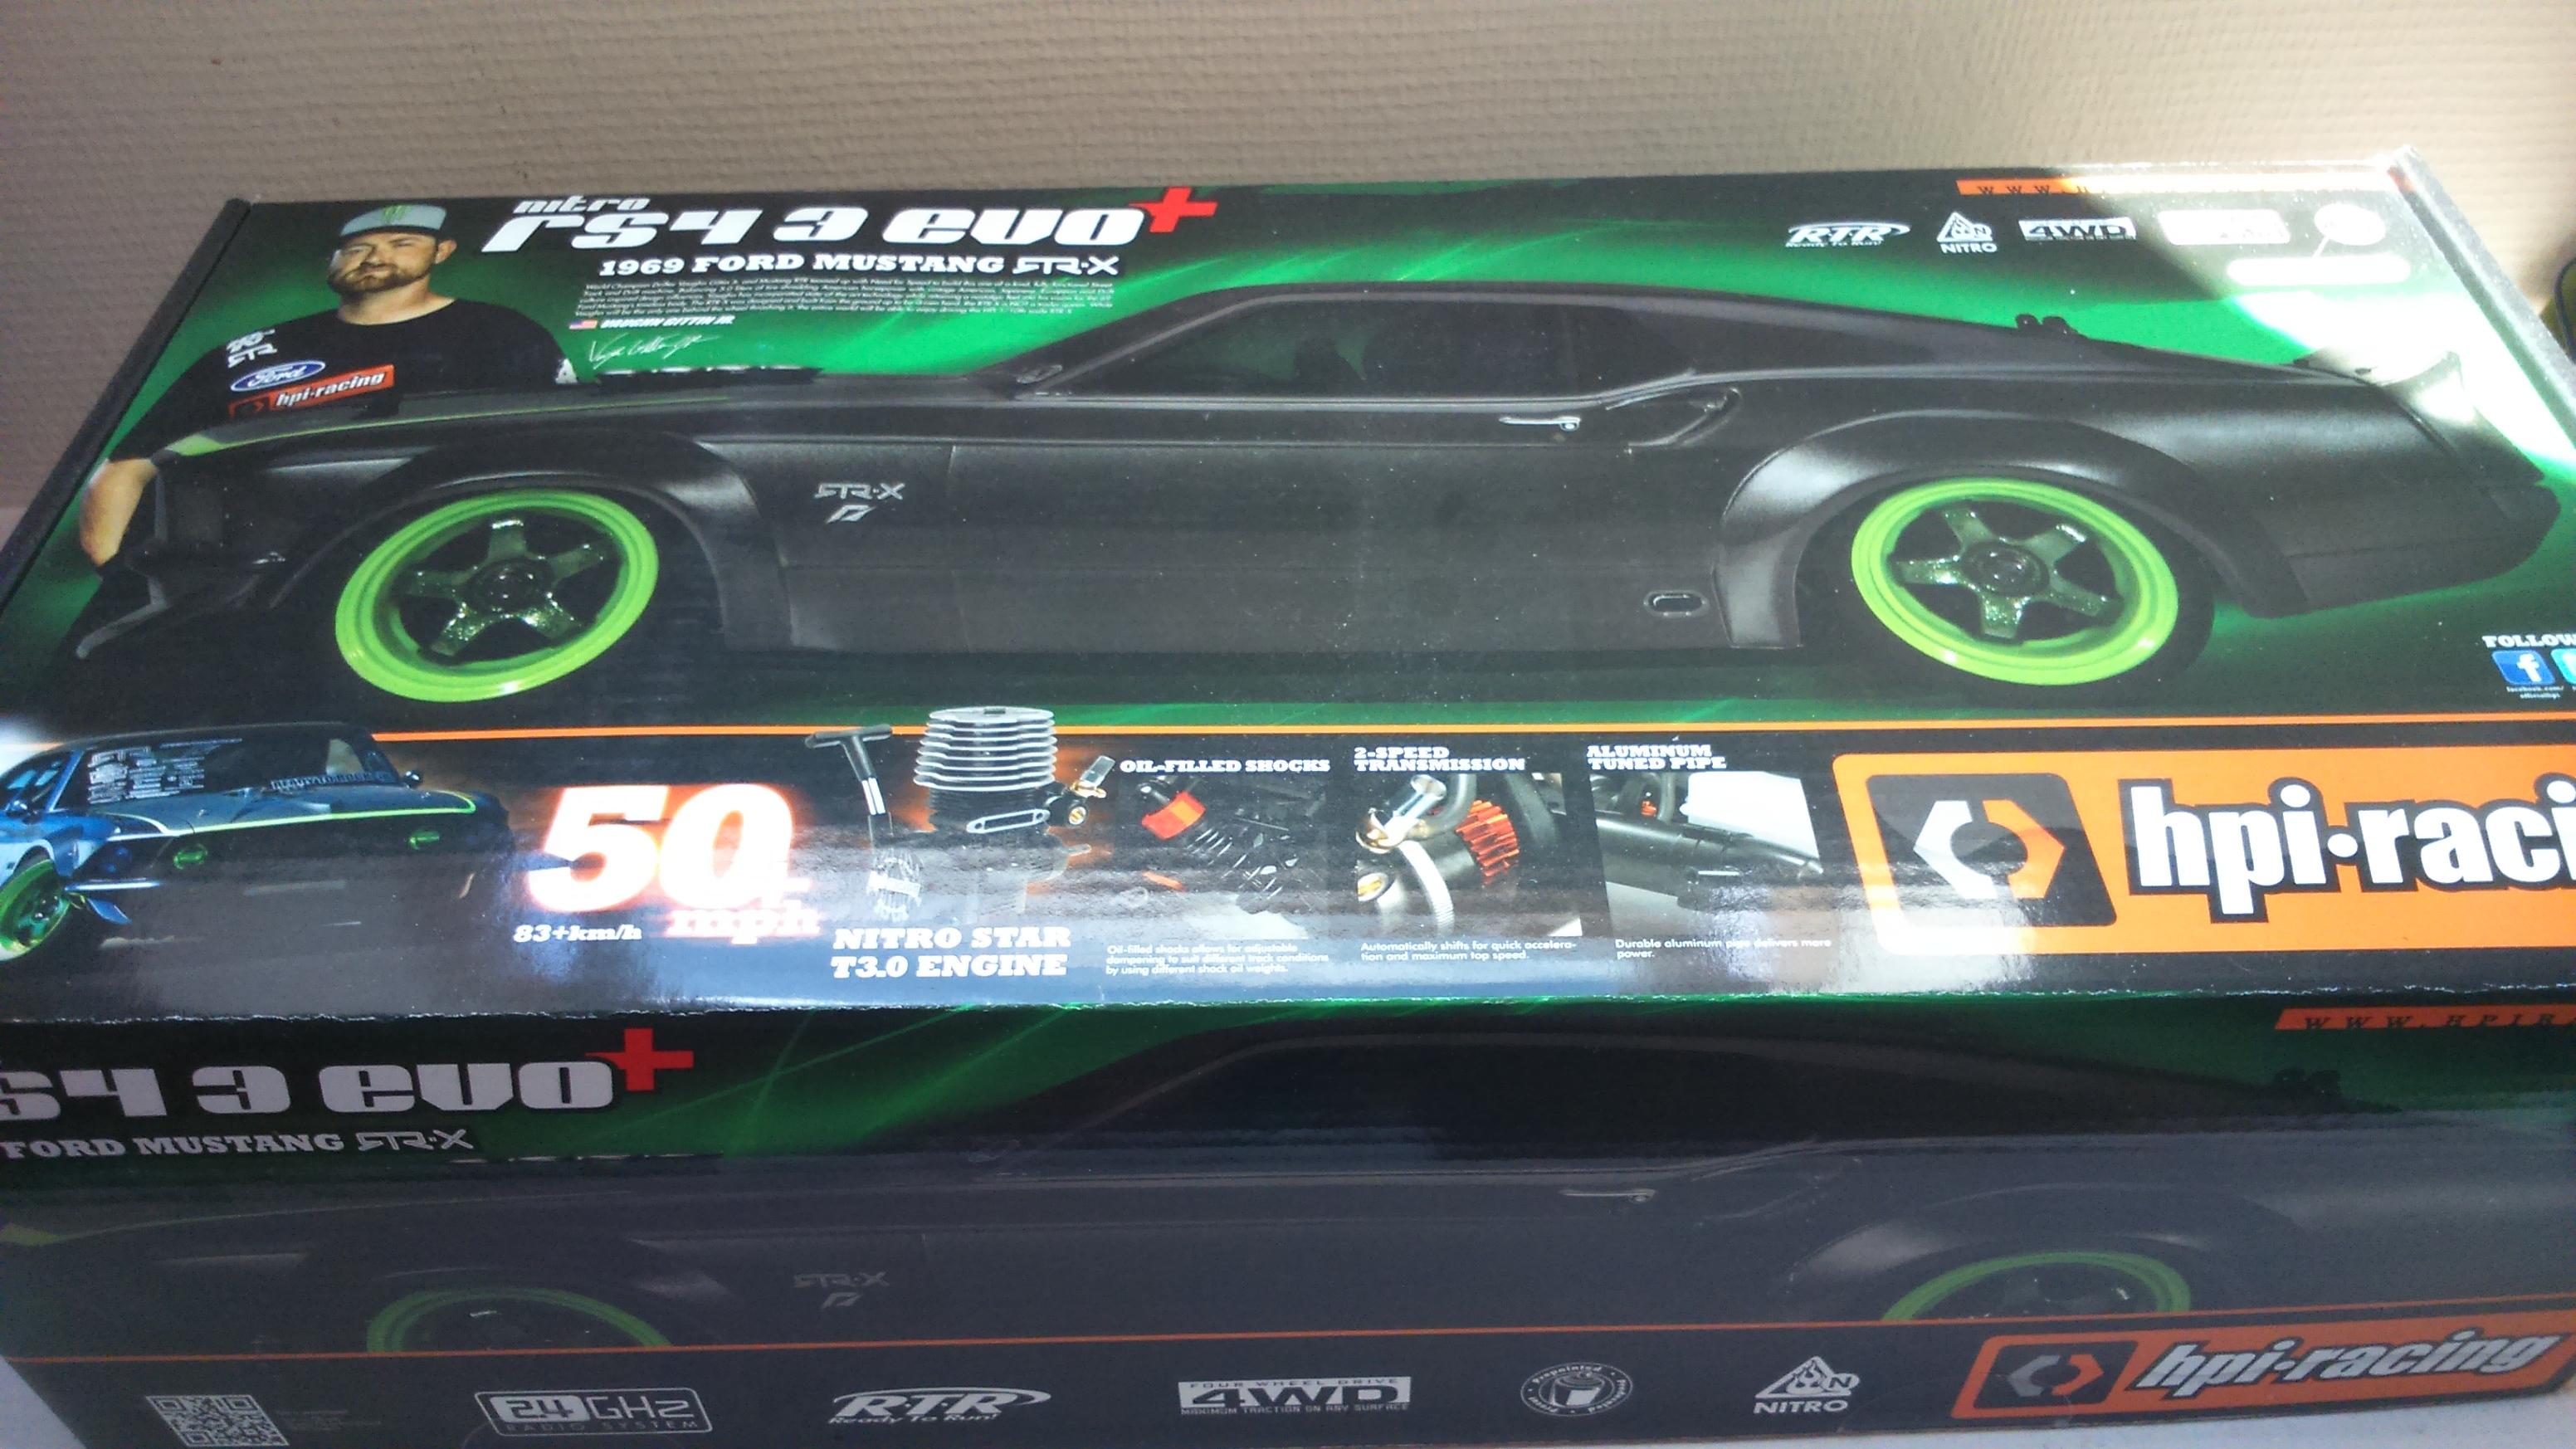 [KingLyche] Ma Nitro RS4 3 EVO+ Mustang 1969 150619042430127186